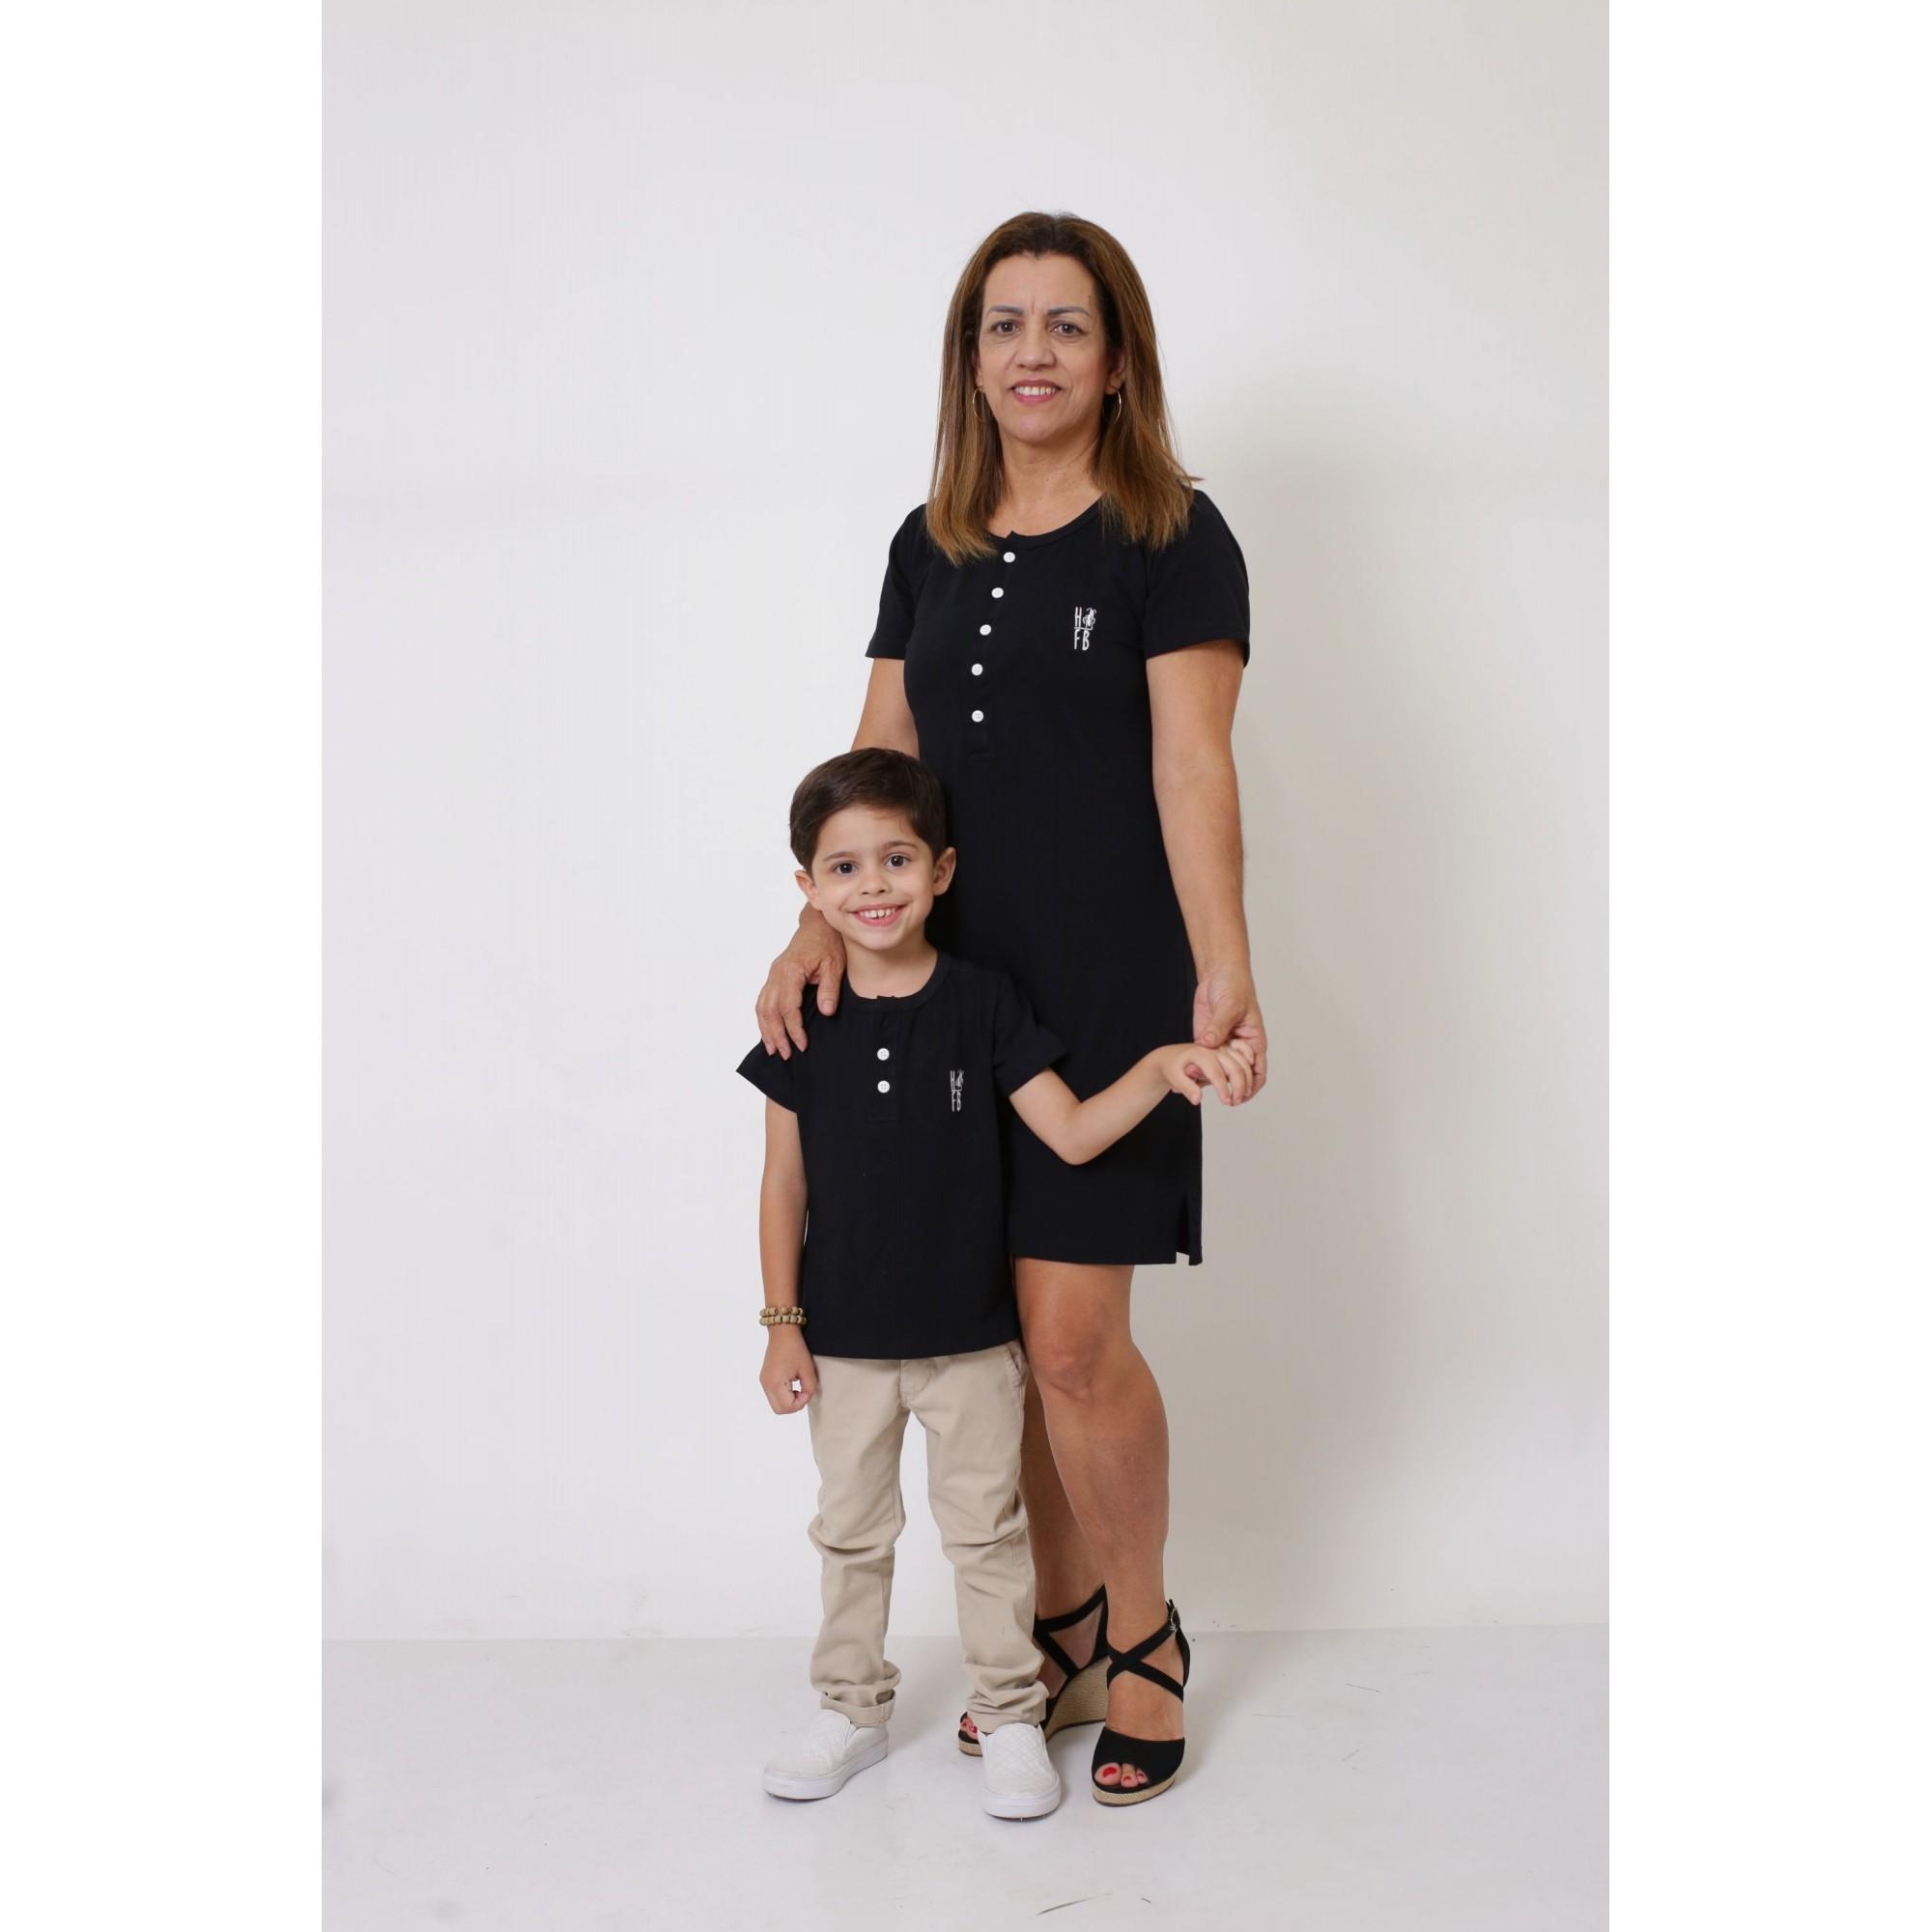 AVÓ E NETO > Kit Vestido + T-shirt Unissex ou Body Infantil - Henley - Preto [Coleção Tal Avó Tal Neto]  - Heitor Fashion Brazil